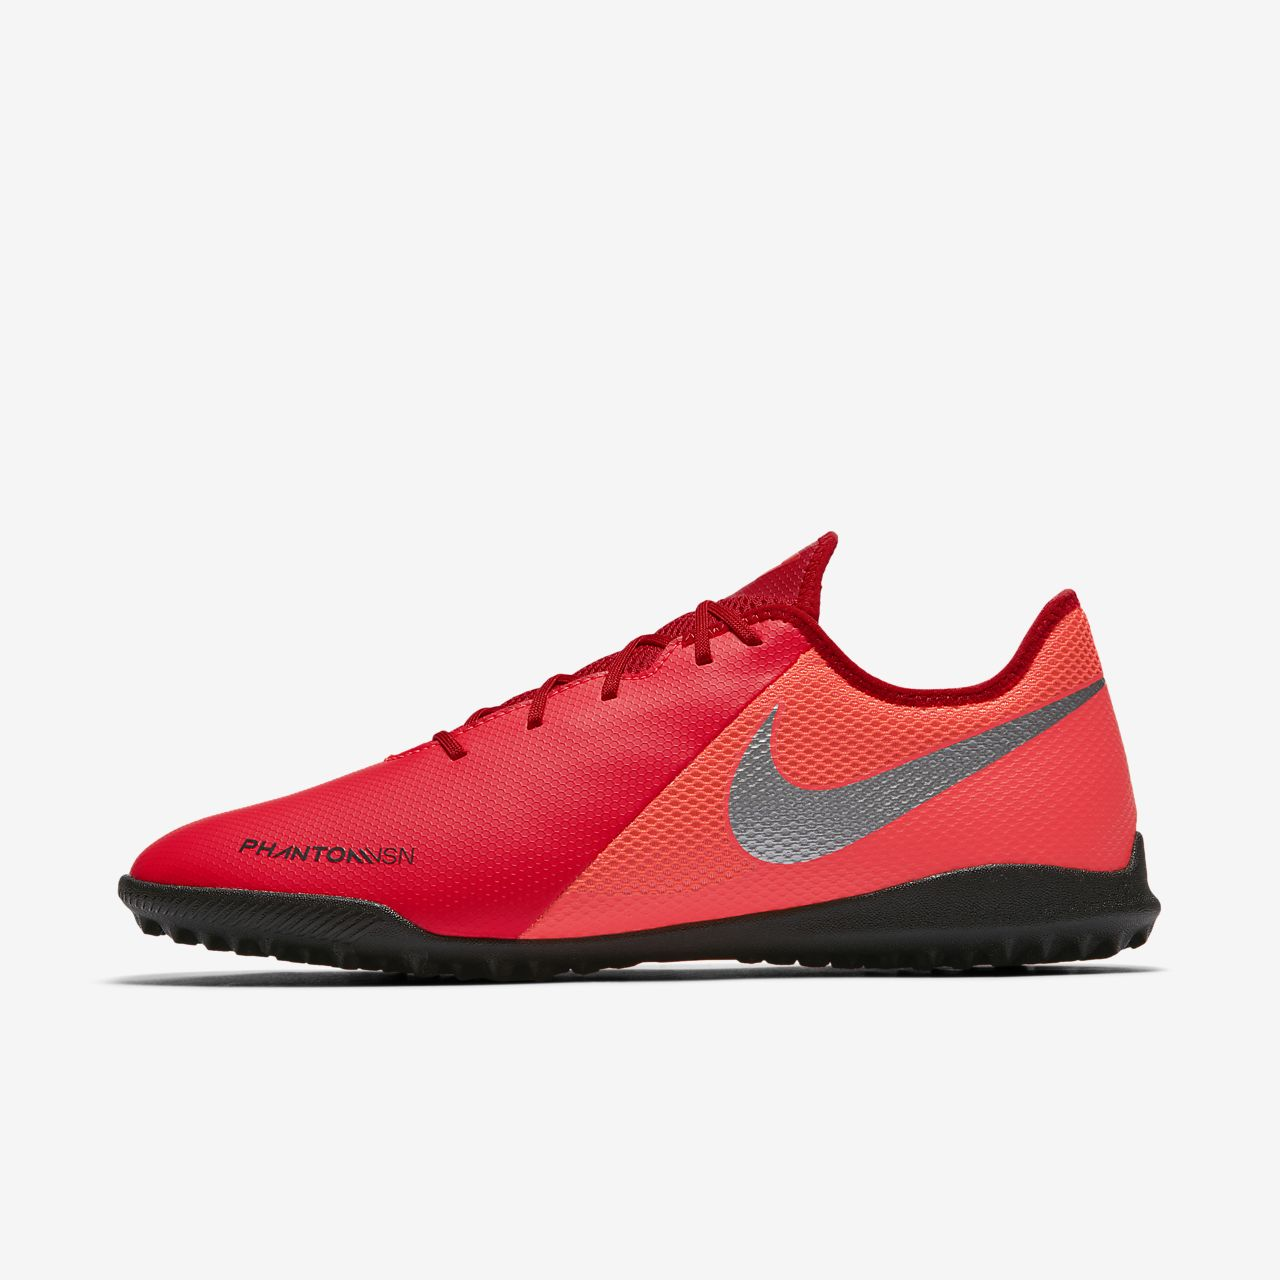 Calcio Vision Per Erba Phantom Artificialesintetica Scarpa Nike Da v5wqfxB0a